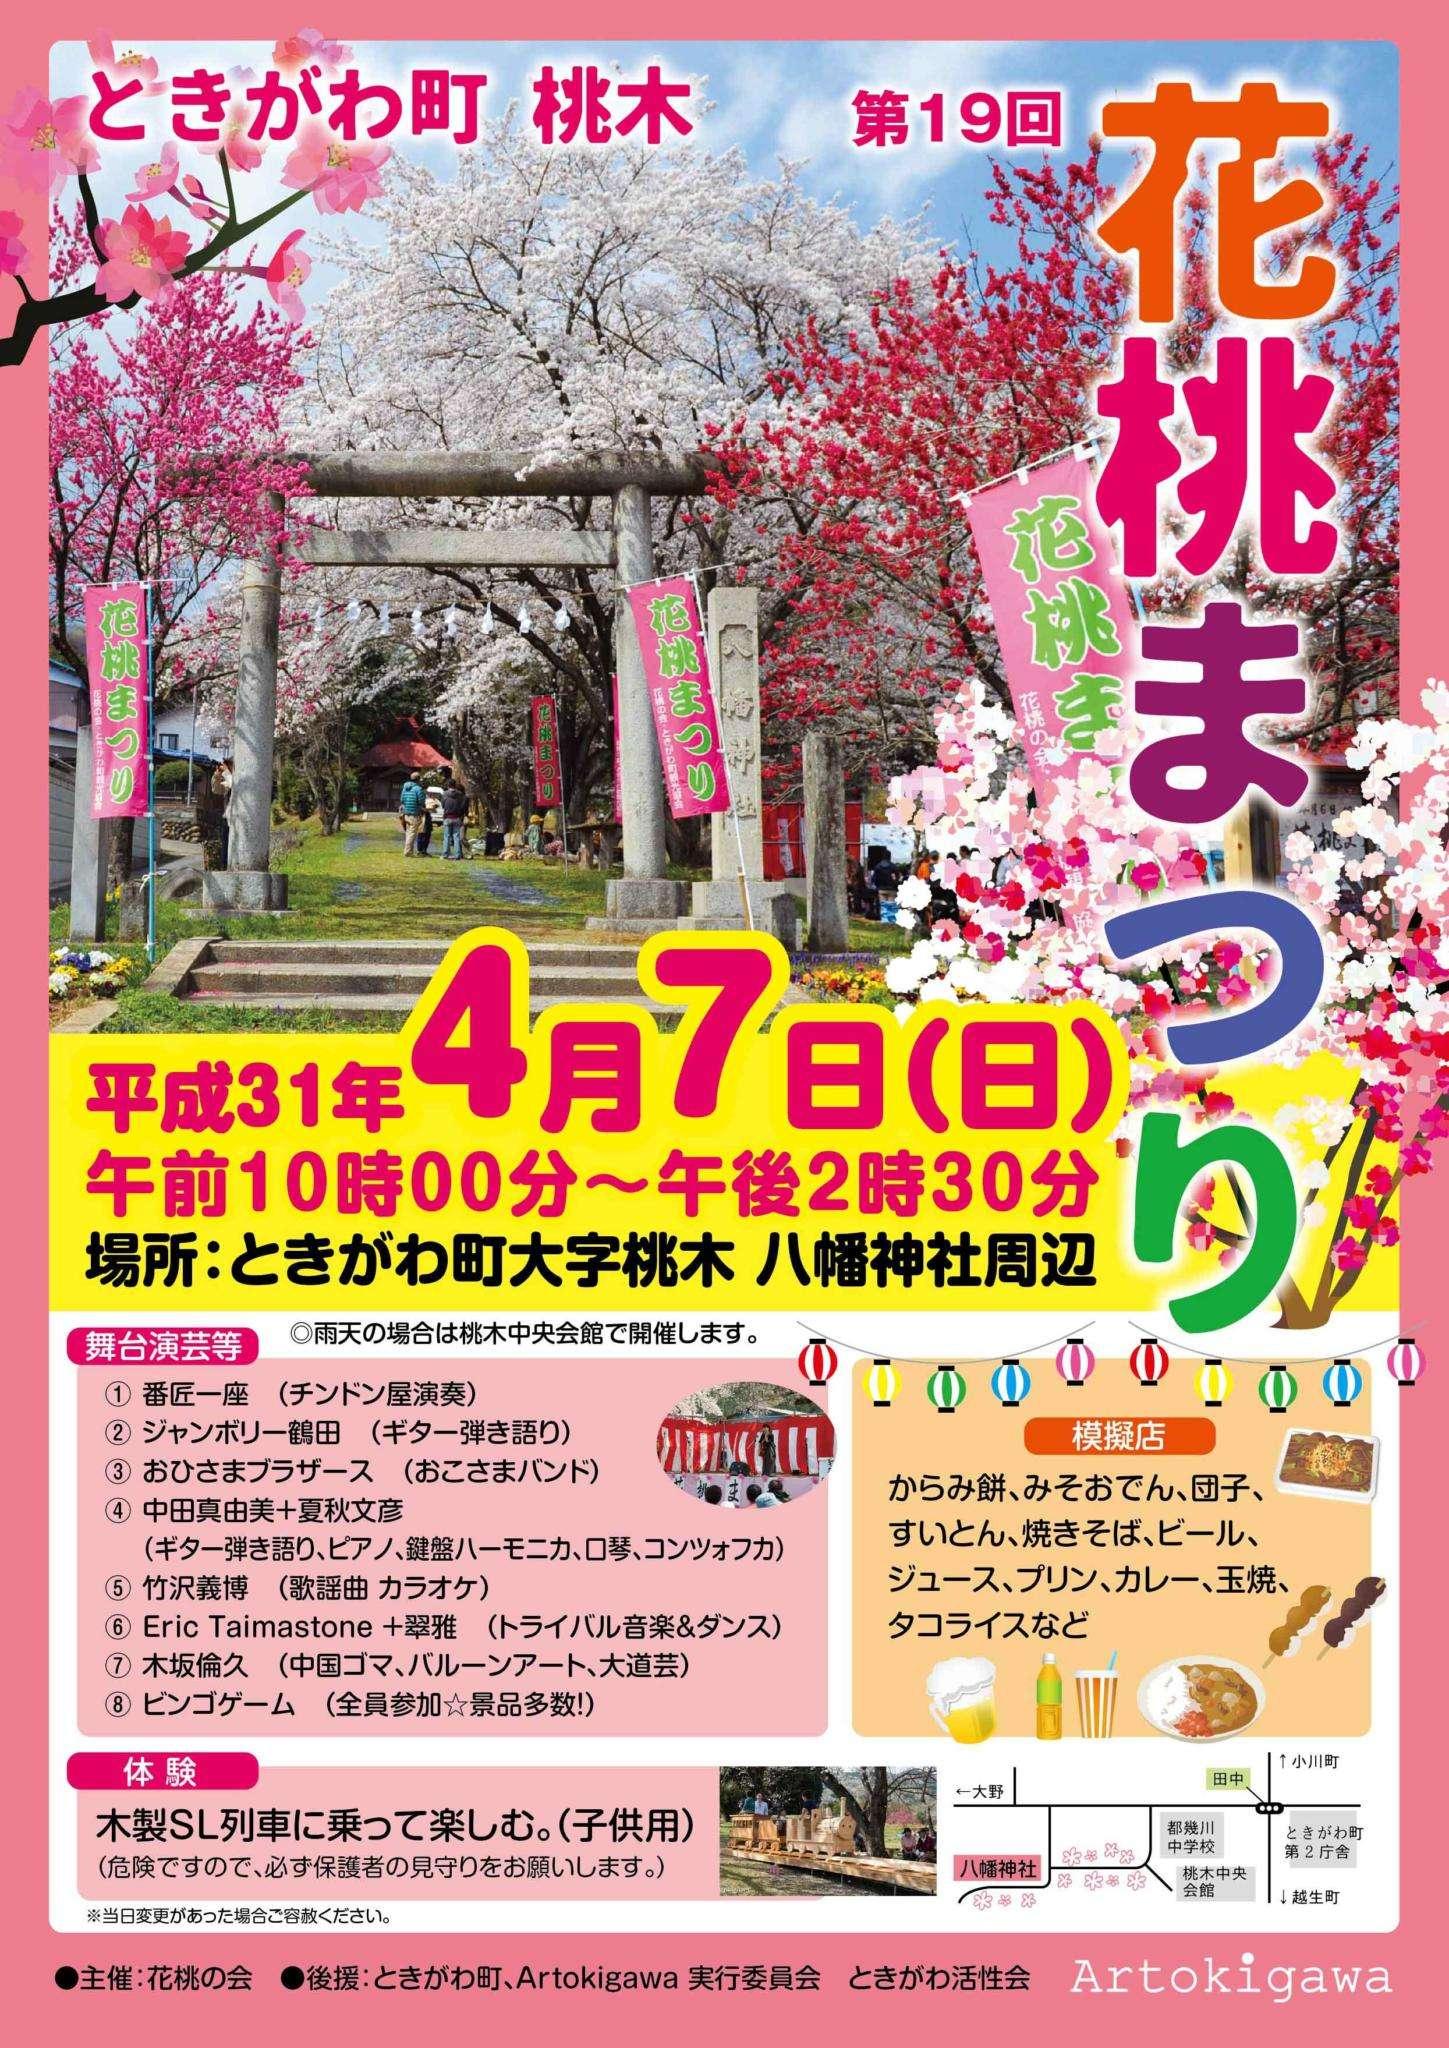 Tokigawa Peach Blossom Festival